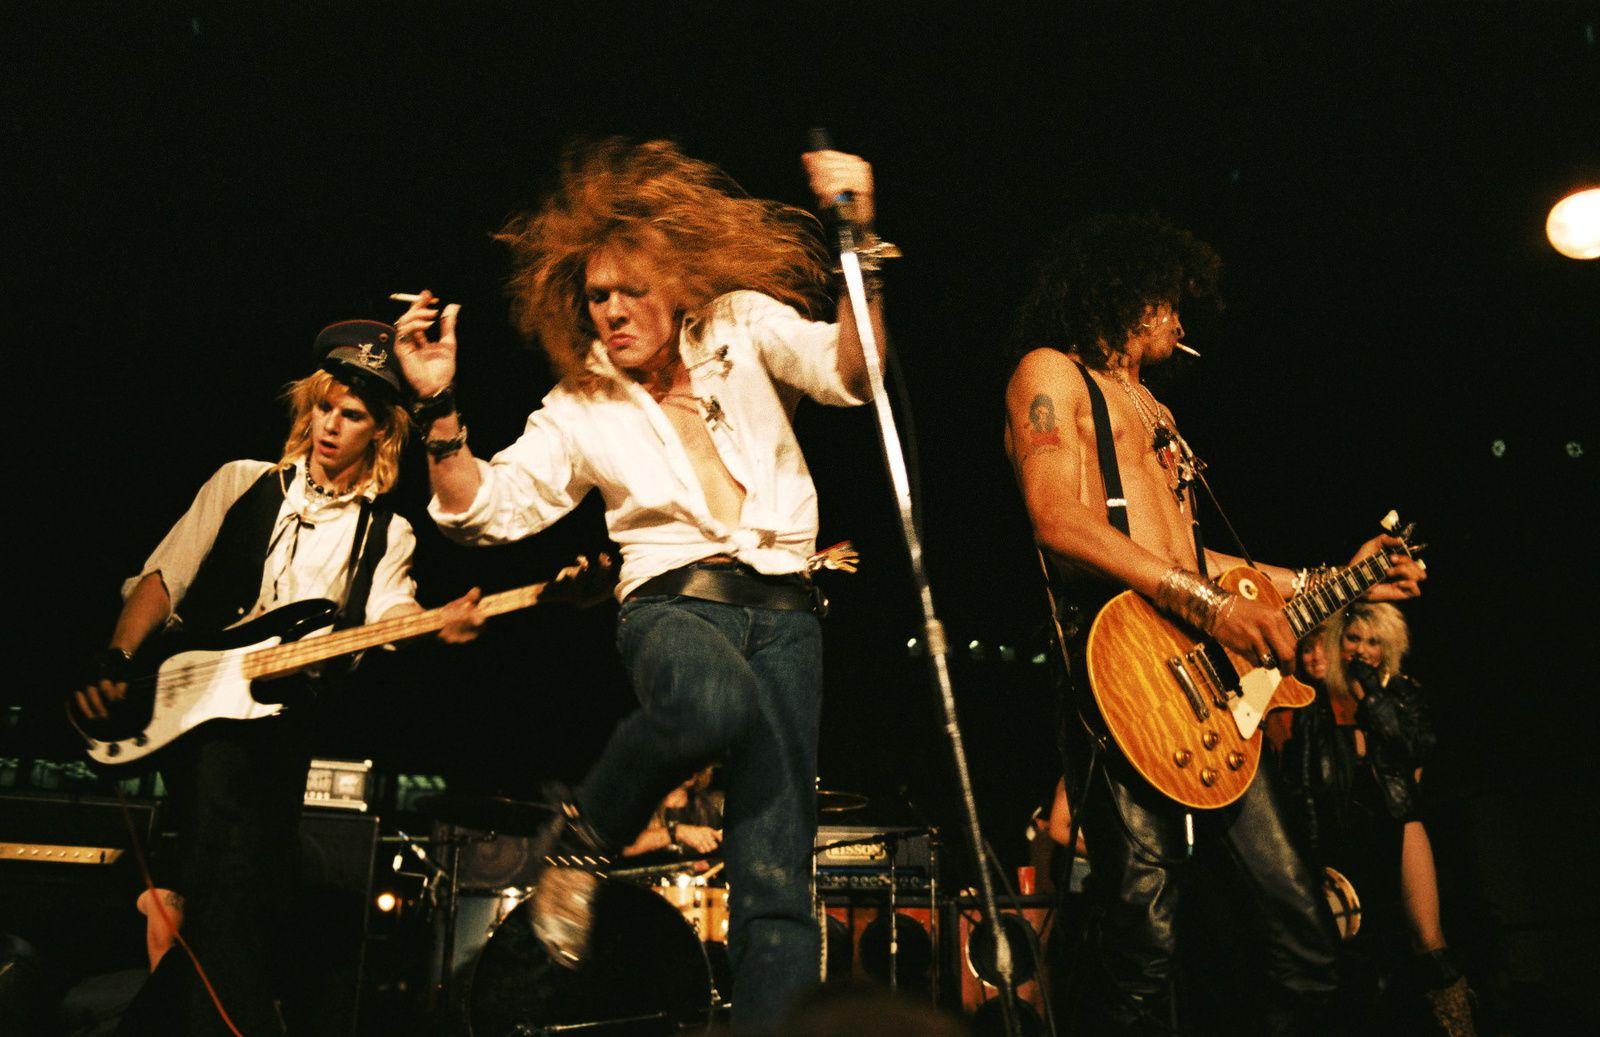 Axl Rose, Slash and Duff McKagan